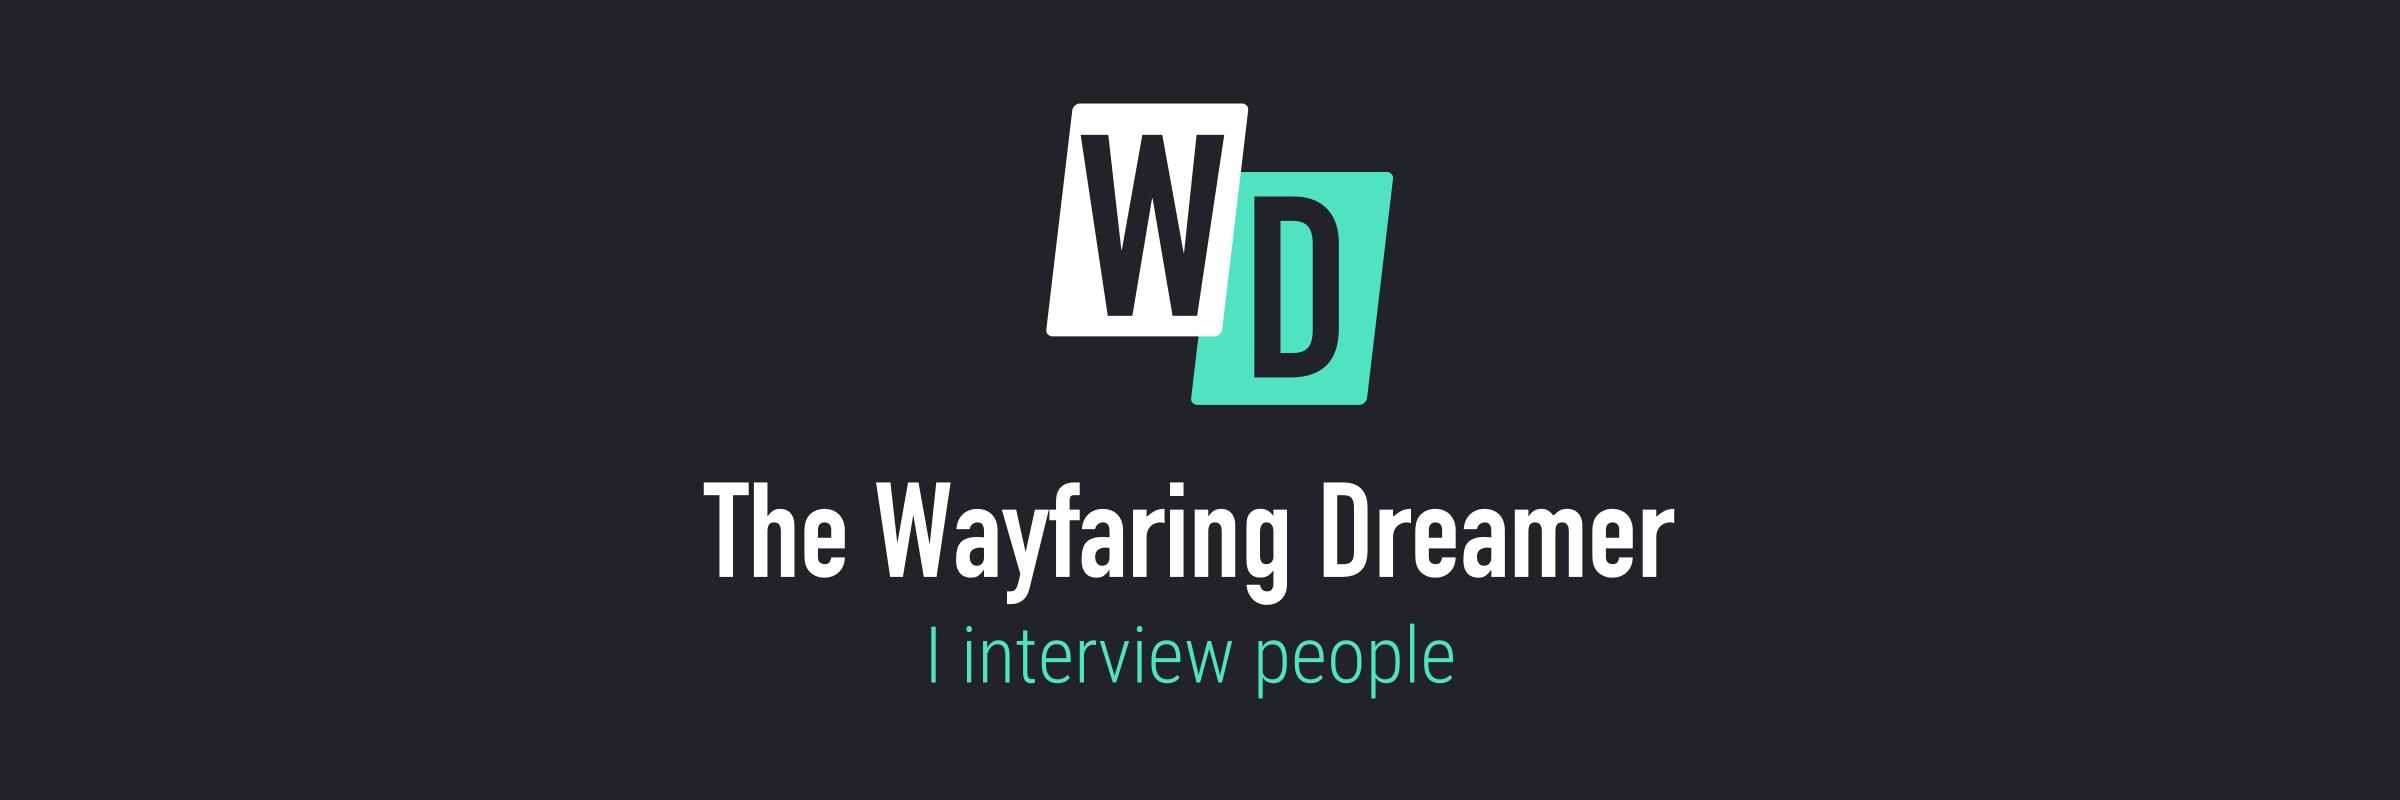 The Wayfaring Dreamer logo